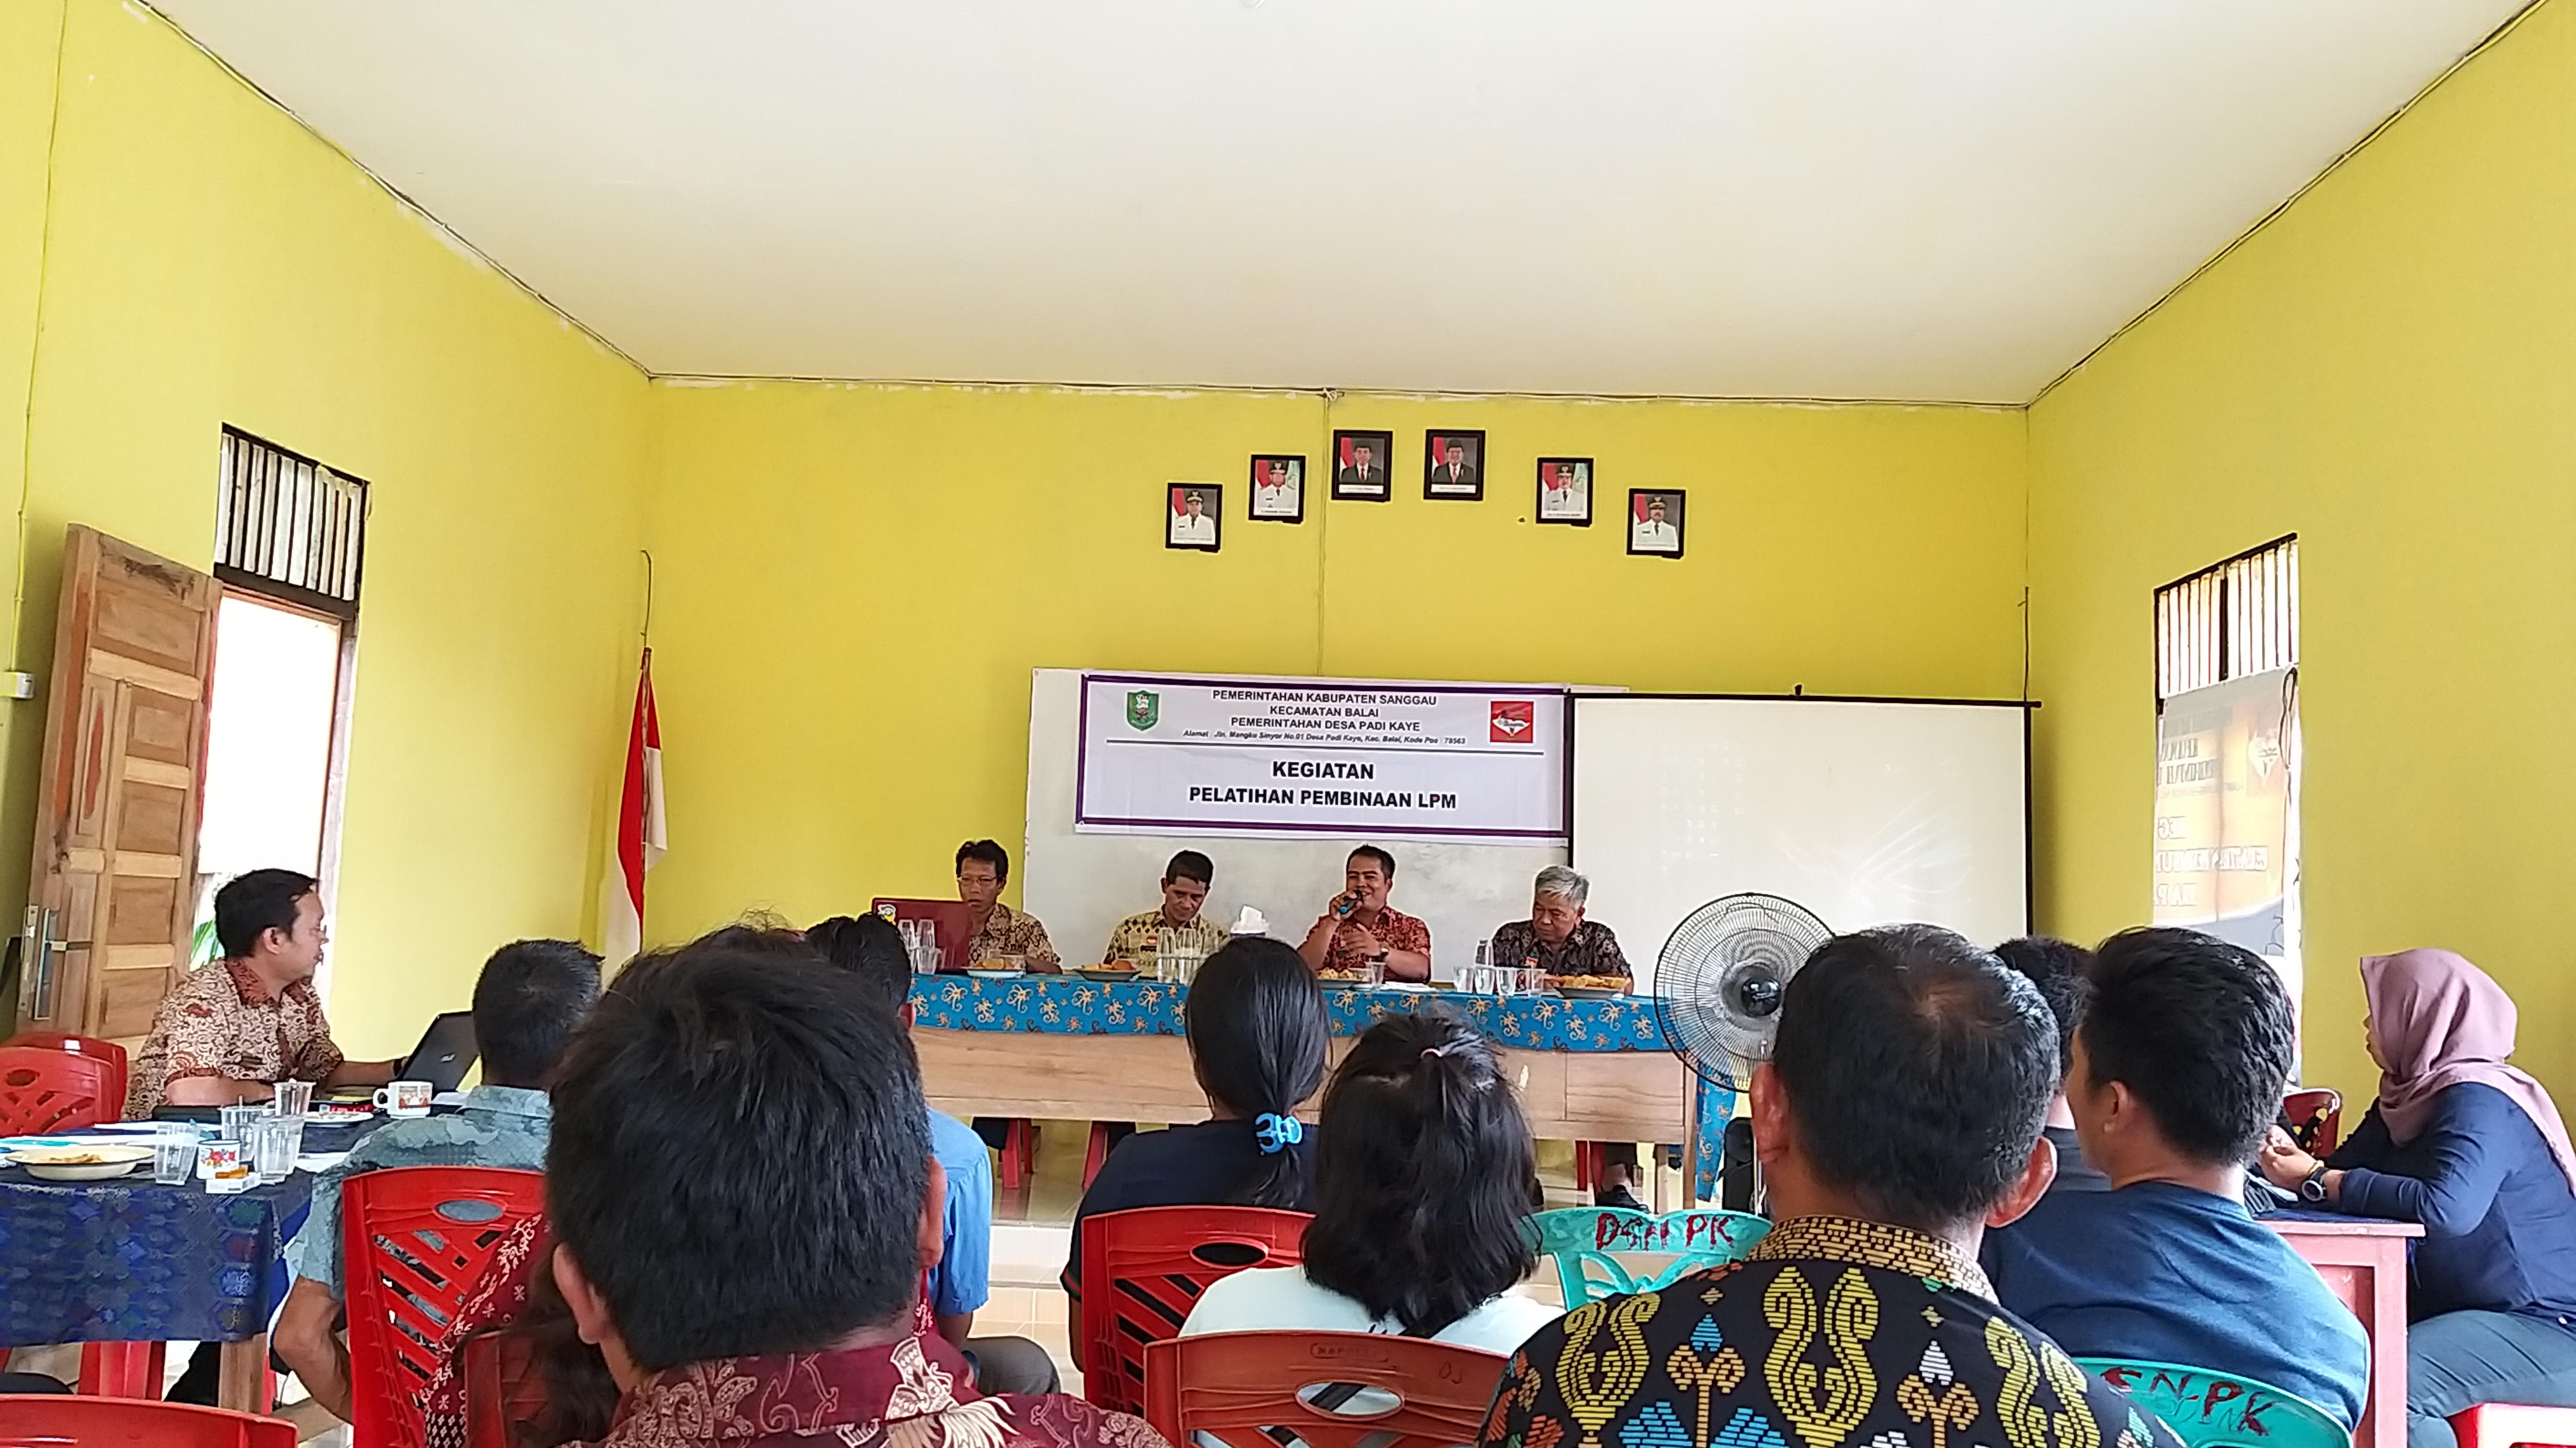 Pelatihan dan Pembinaan LPM Desa Padi Kaye Kec. Balai